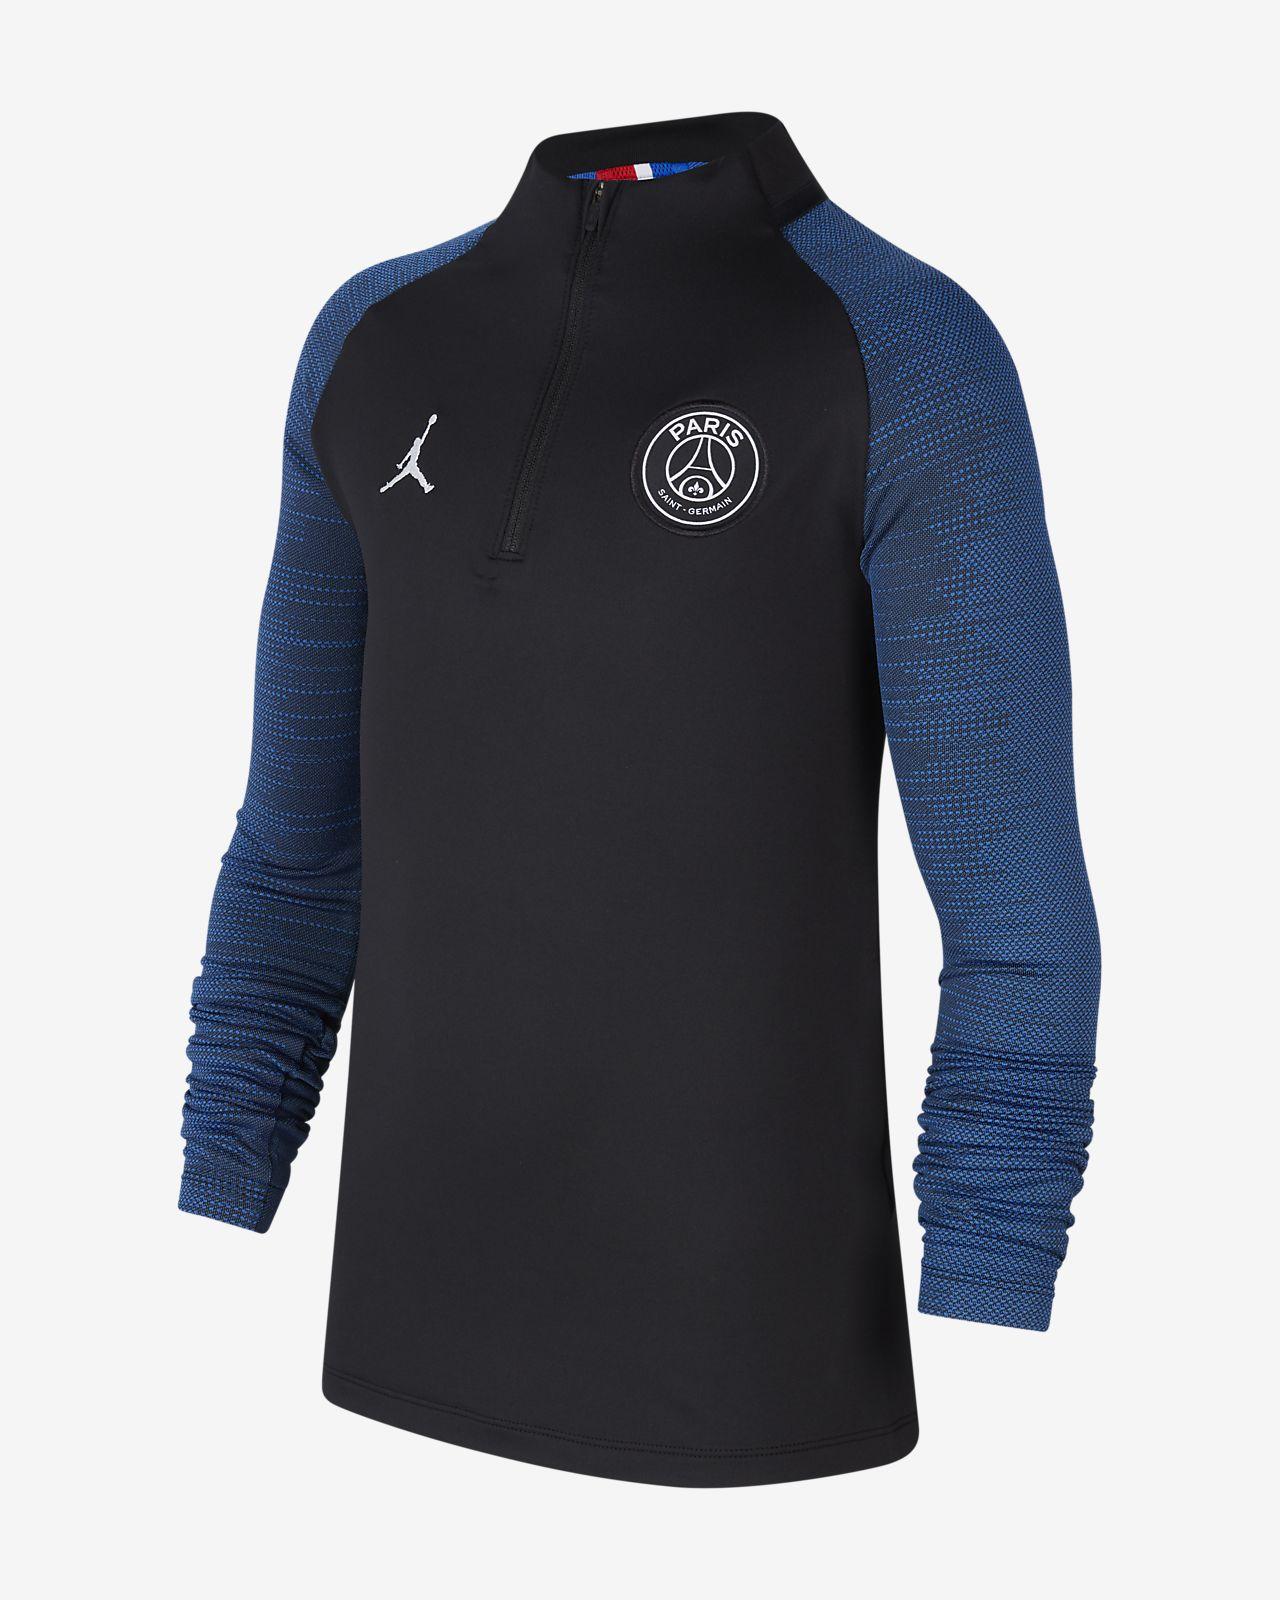 Jordan x Paris Saint-Germain Dri-FIT Strike fotballtreningsoverdel til store barn